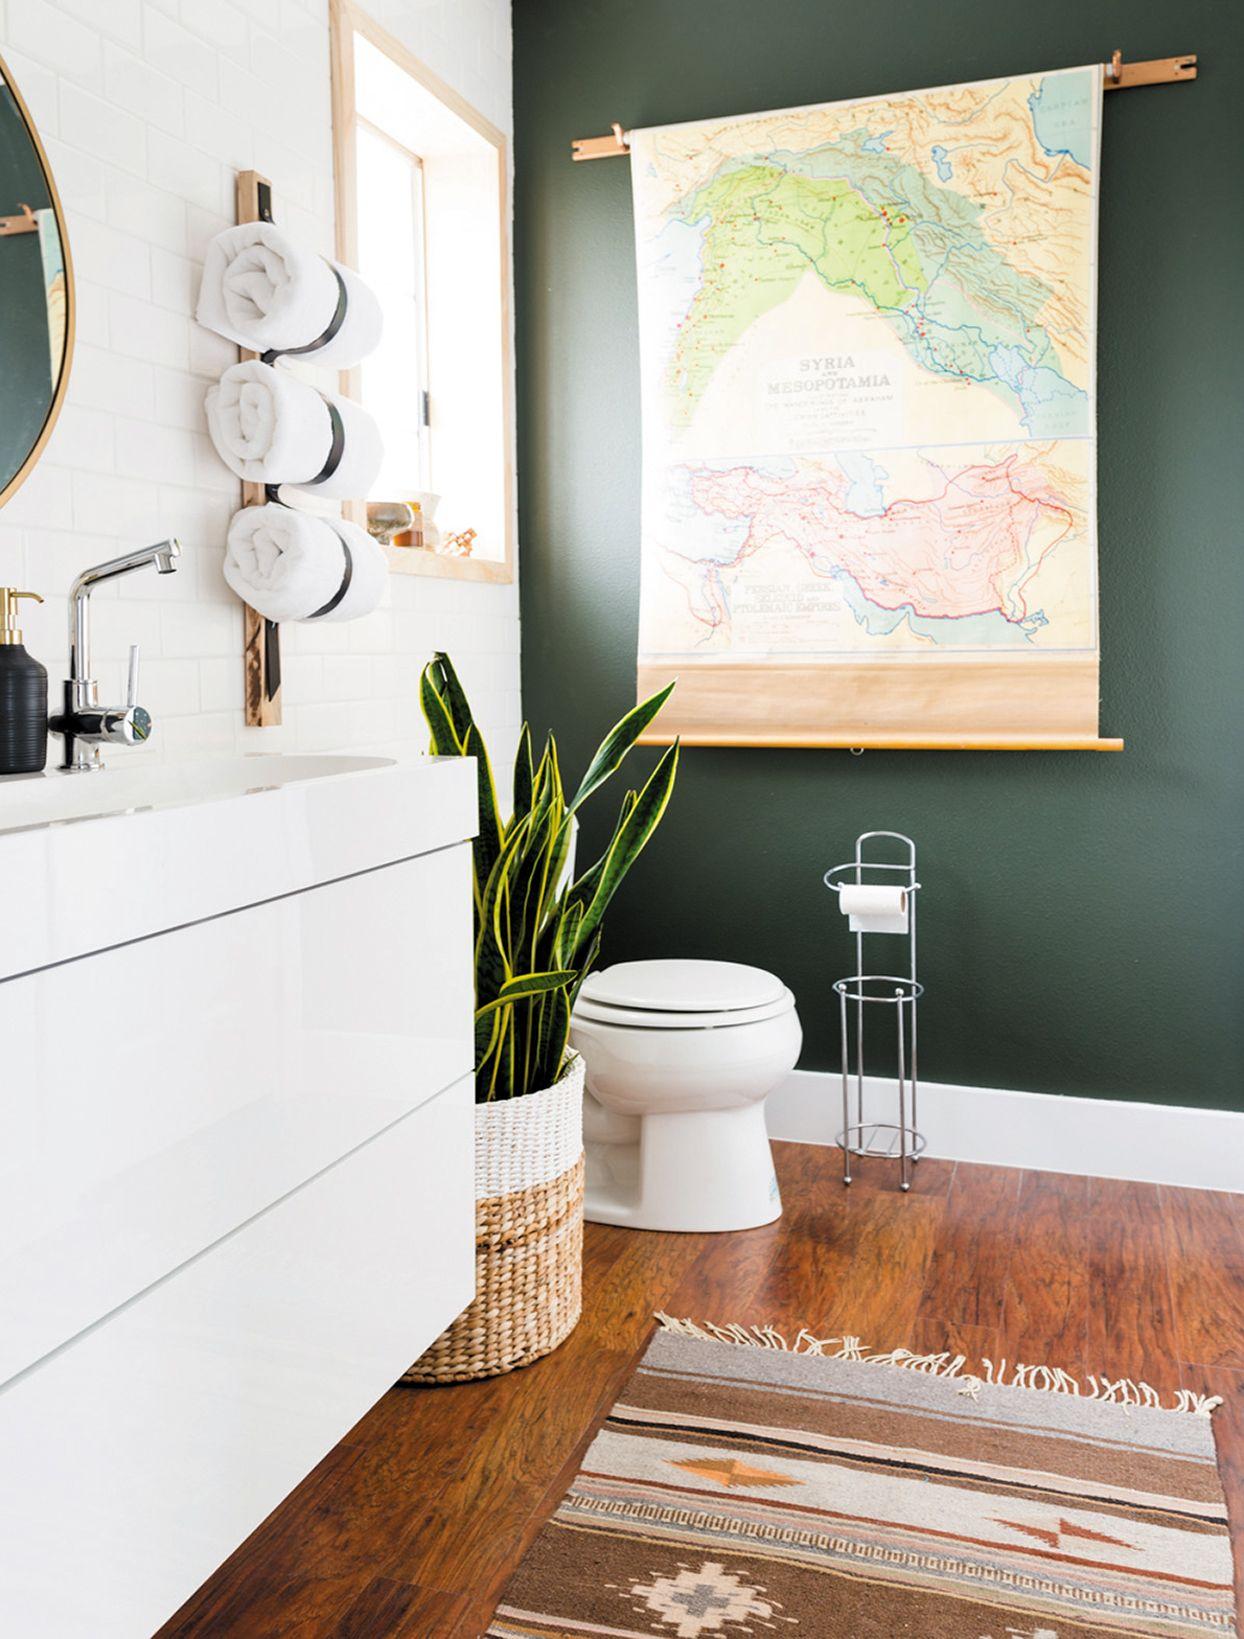 Green Bathroom Black Mirror White Hamper Gold Stool Gold Wall Sconce Green Bathroom Black And White Tiles Bathroom Green Tile Bathroom